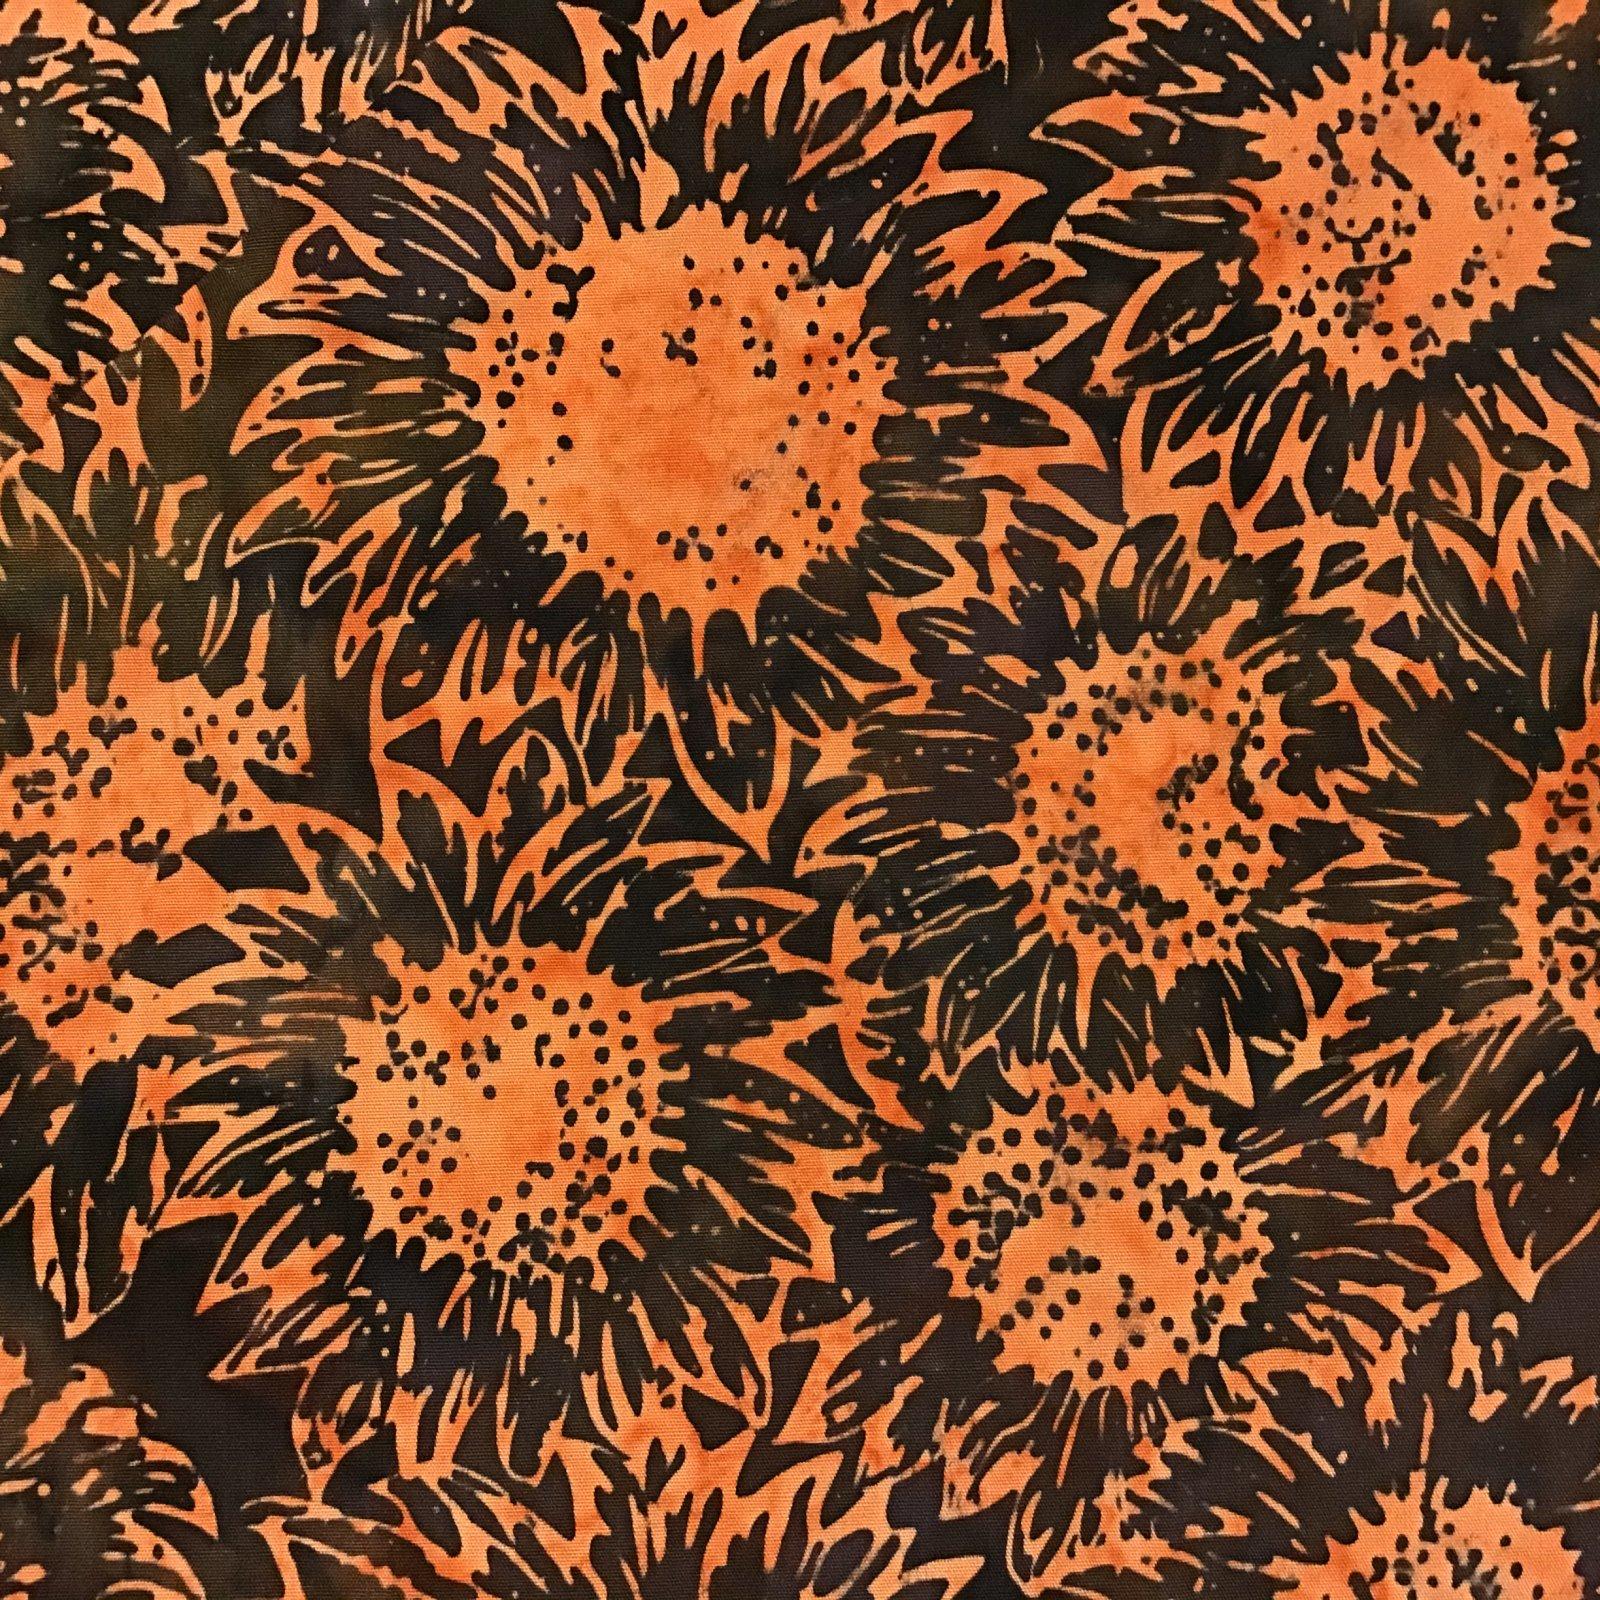 Batik - Indigenous Blanket - Aragon IB-4-1786 - 1pc - 1.09m/43in